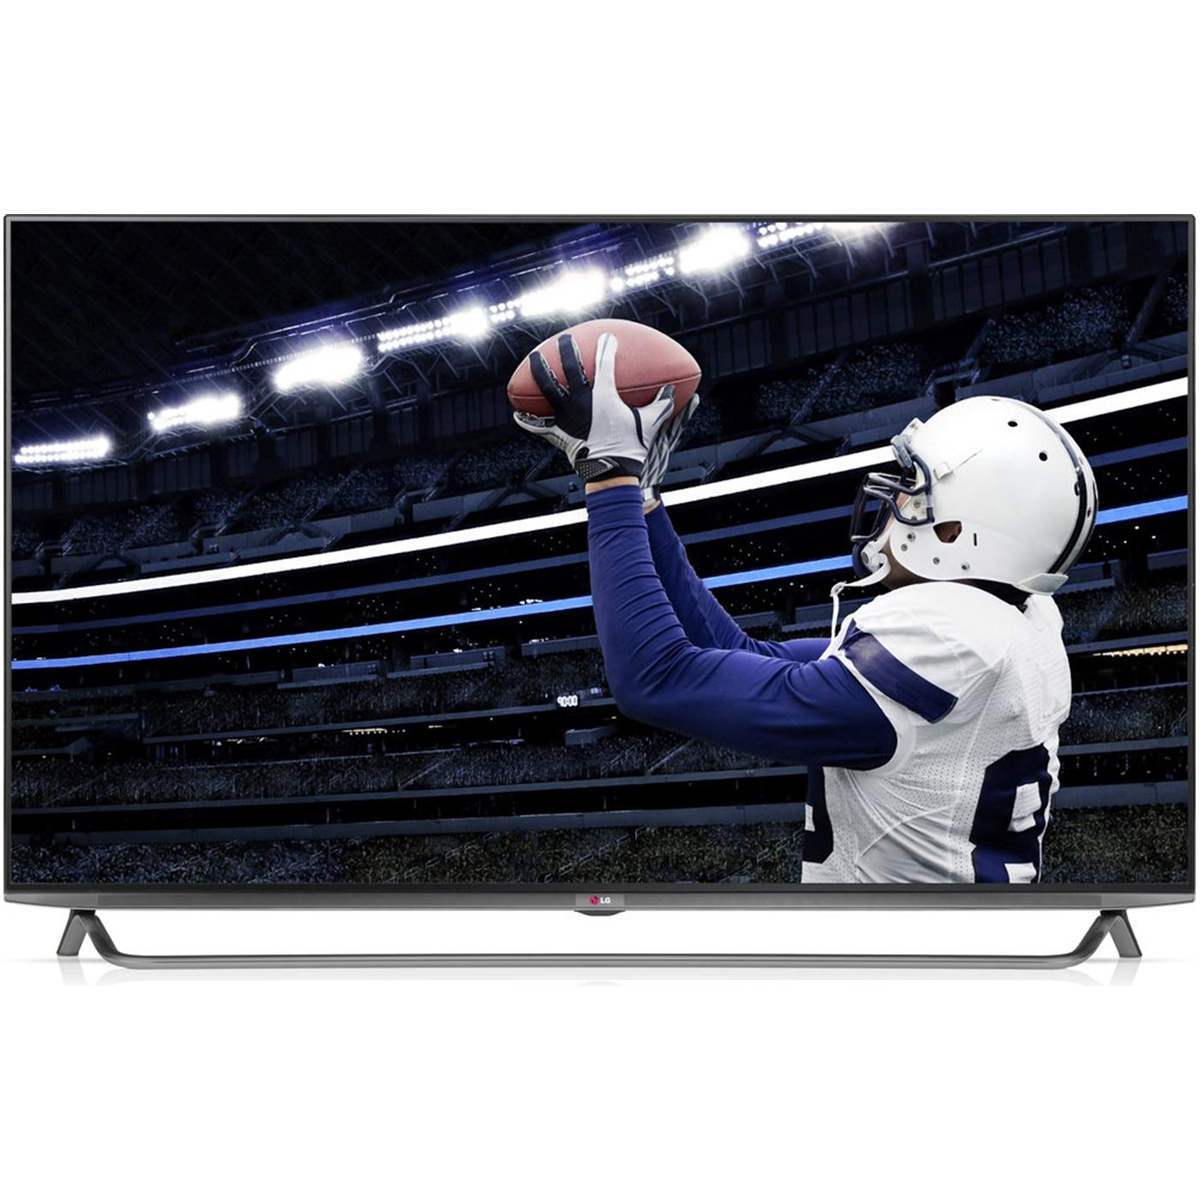 LG 65inch 9200 Series LED 4K Ultra HDTV - 65UB9200